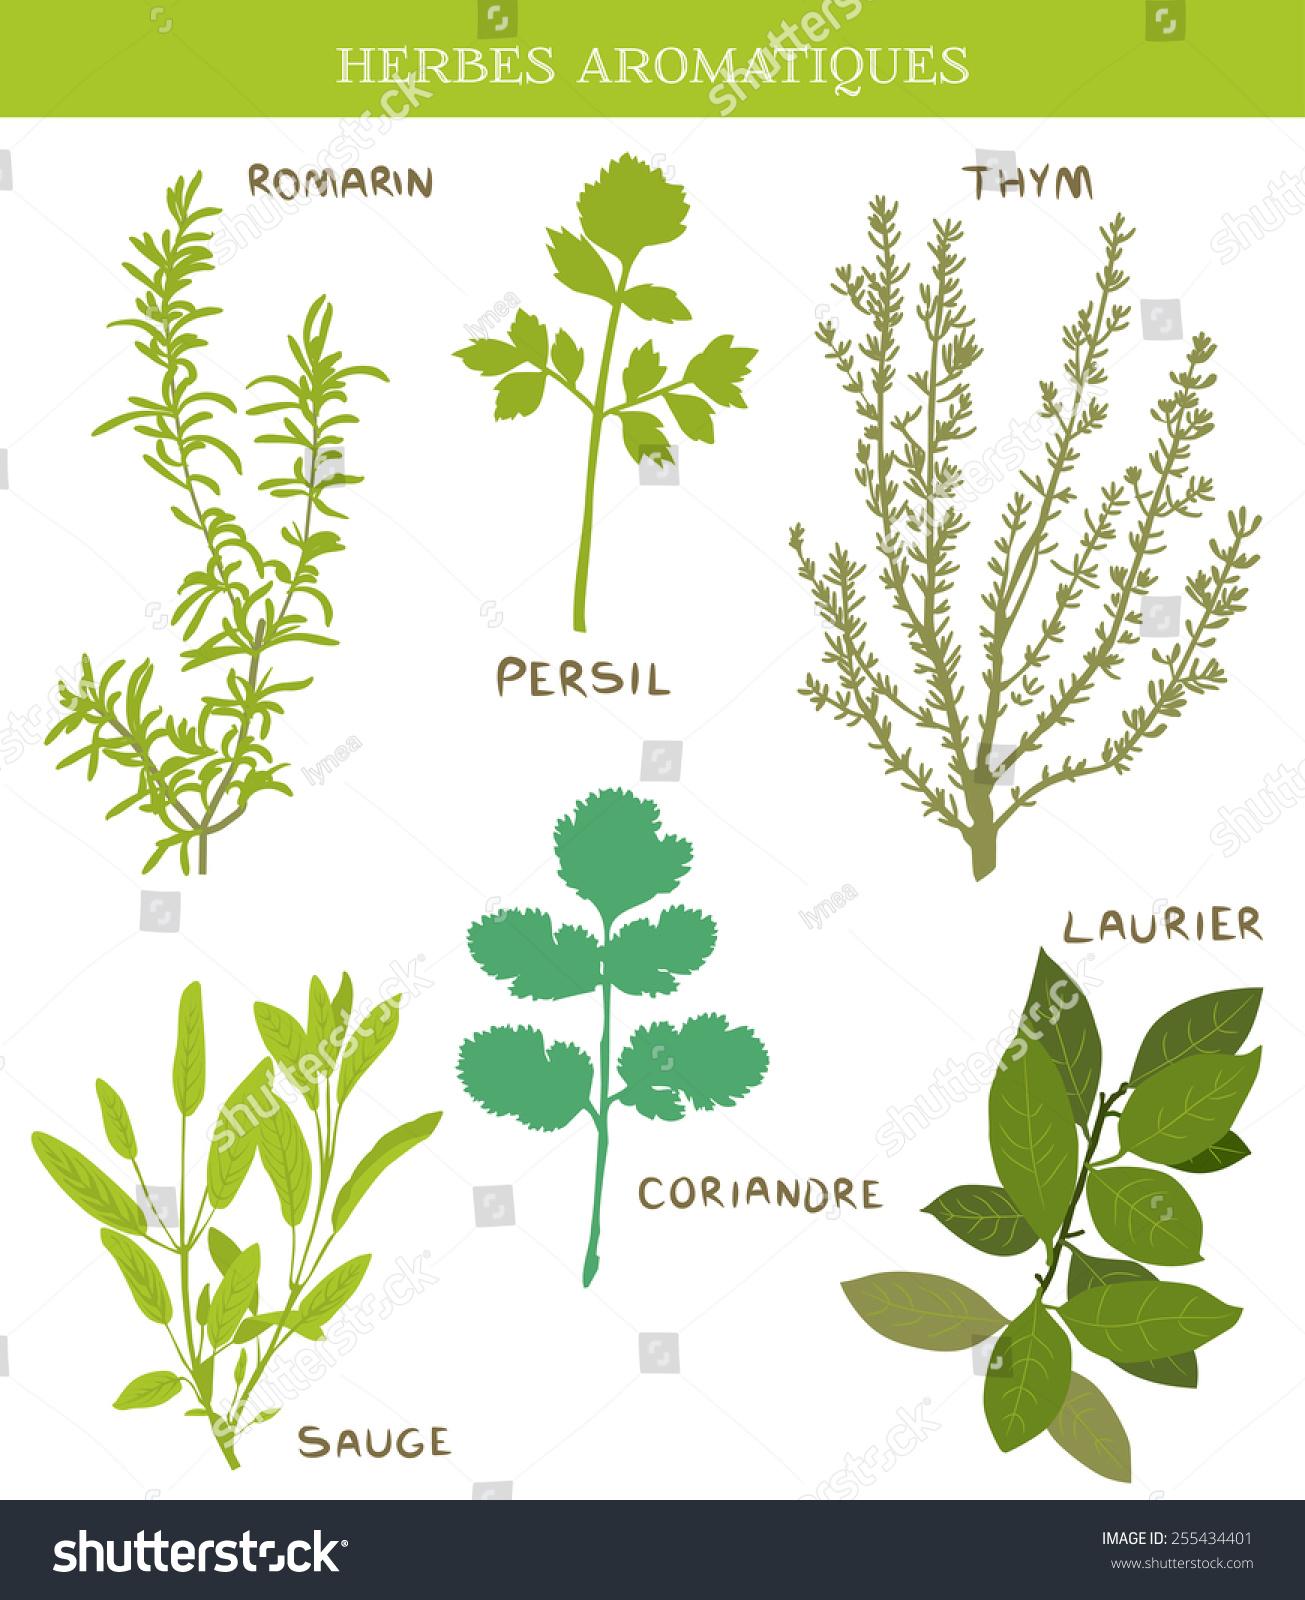 herbes aromatiques fresh herbs thym thyme laurier bay leaves sauge sage persil. Black Bedroom Furniture Sets. Home Design Ideas